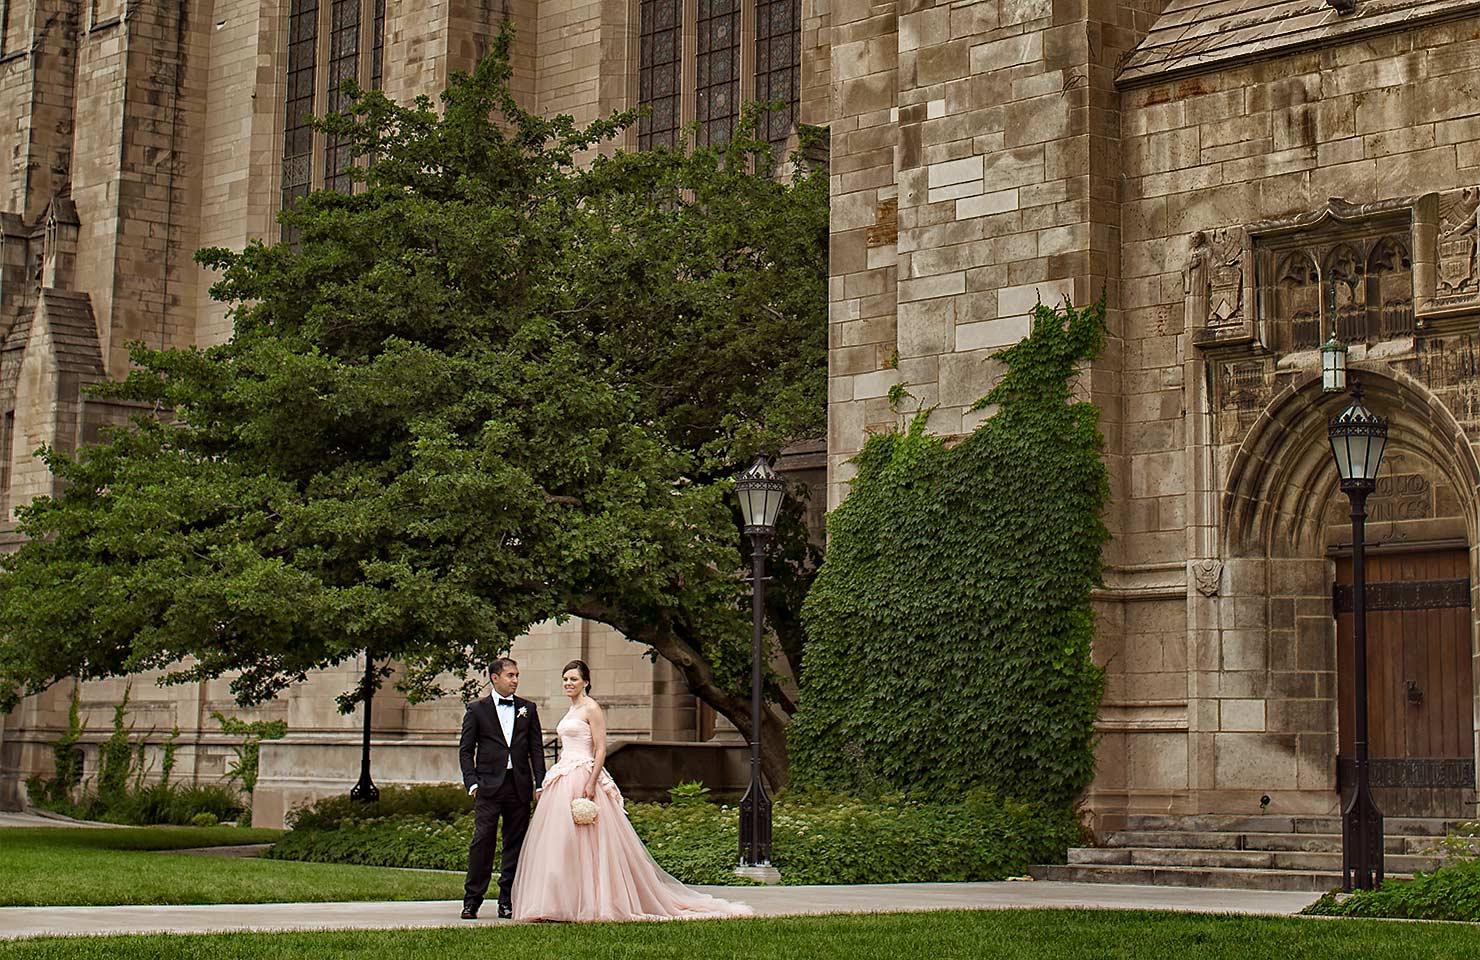 University of Chicago wedding at Smart Museum of Art – Lynn+Satya